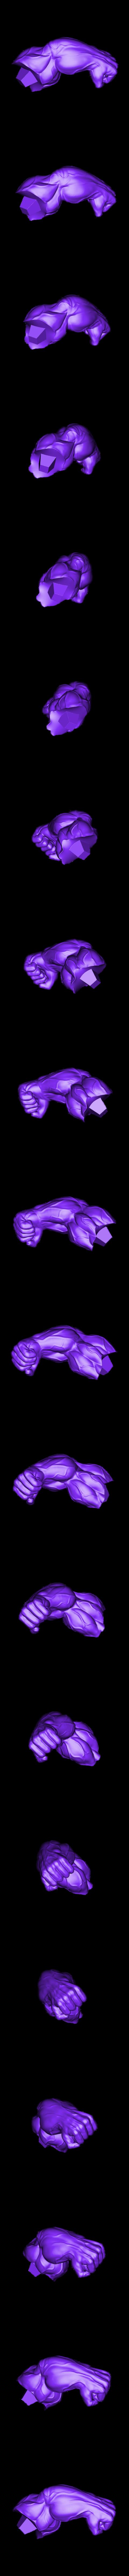 Lhand_300mm.stl Download STL file Hulk Angry - Super Hero - Marvel 3D print model • 3D print model, Bstar3Dart